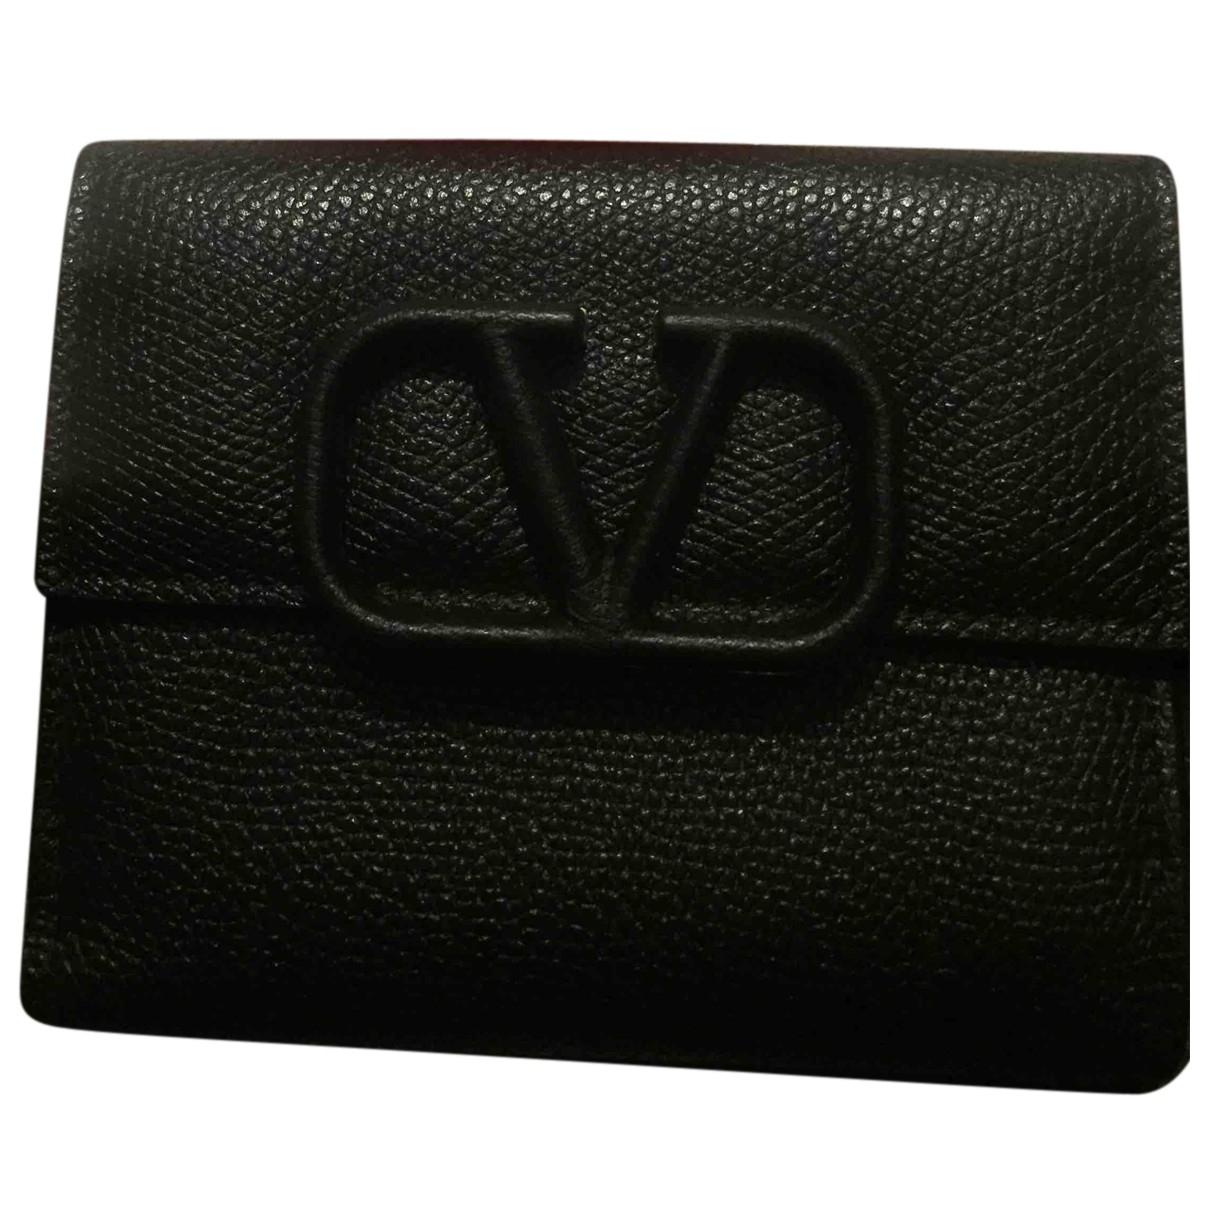 Valentino Garavani N Blue Leather wallet for Women N